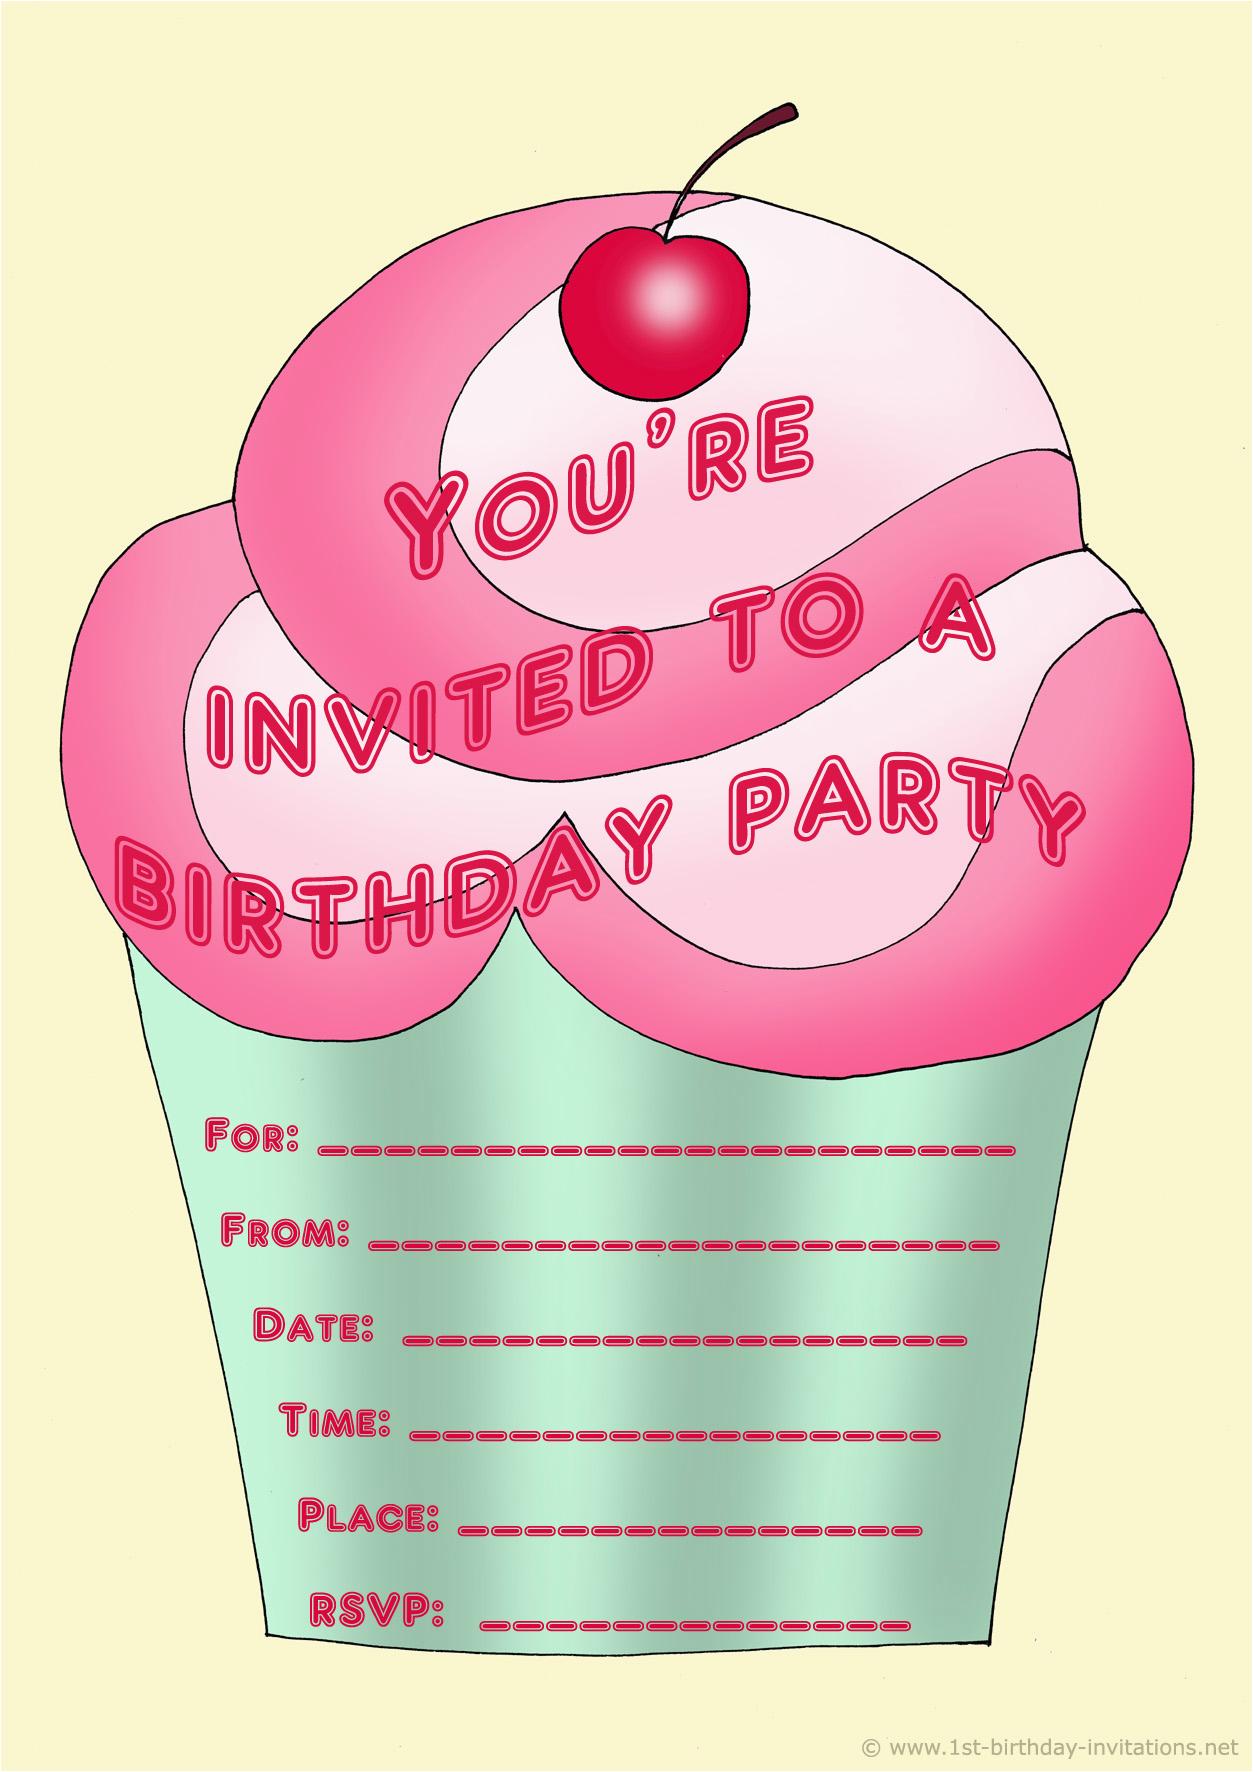 Personalized Birthday Invitations Free Printable Personalized Birthday Invitations for Kids 1st